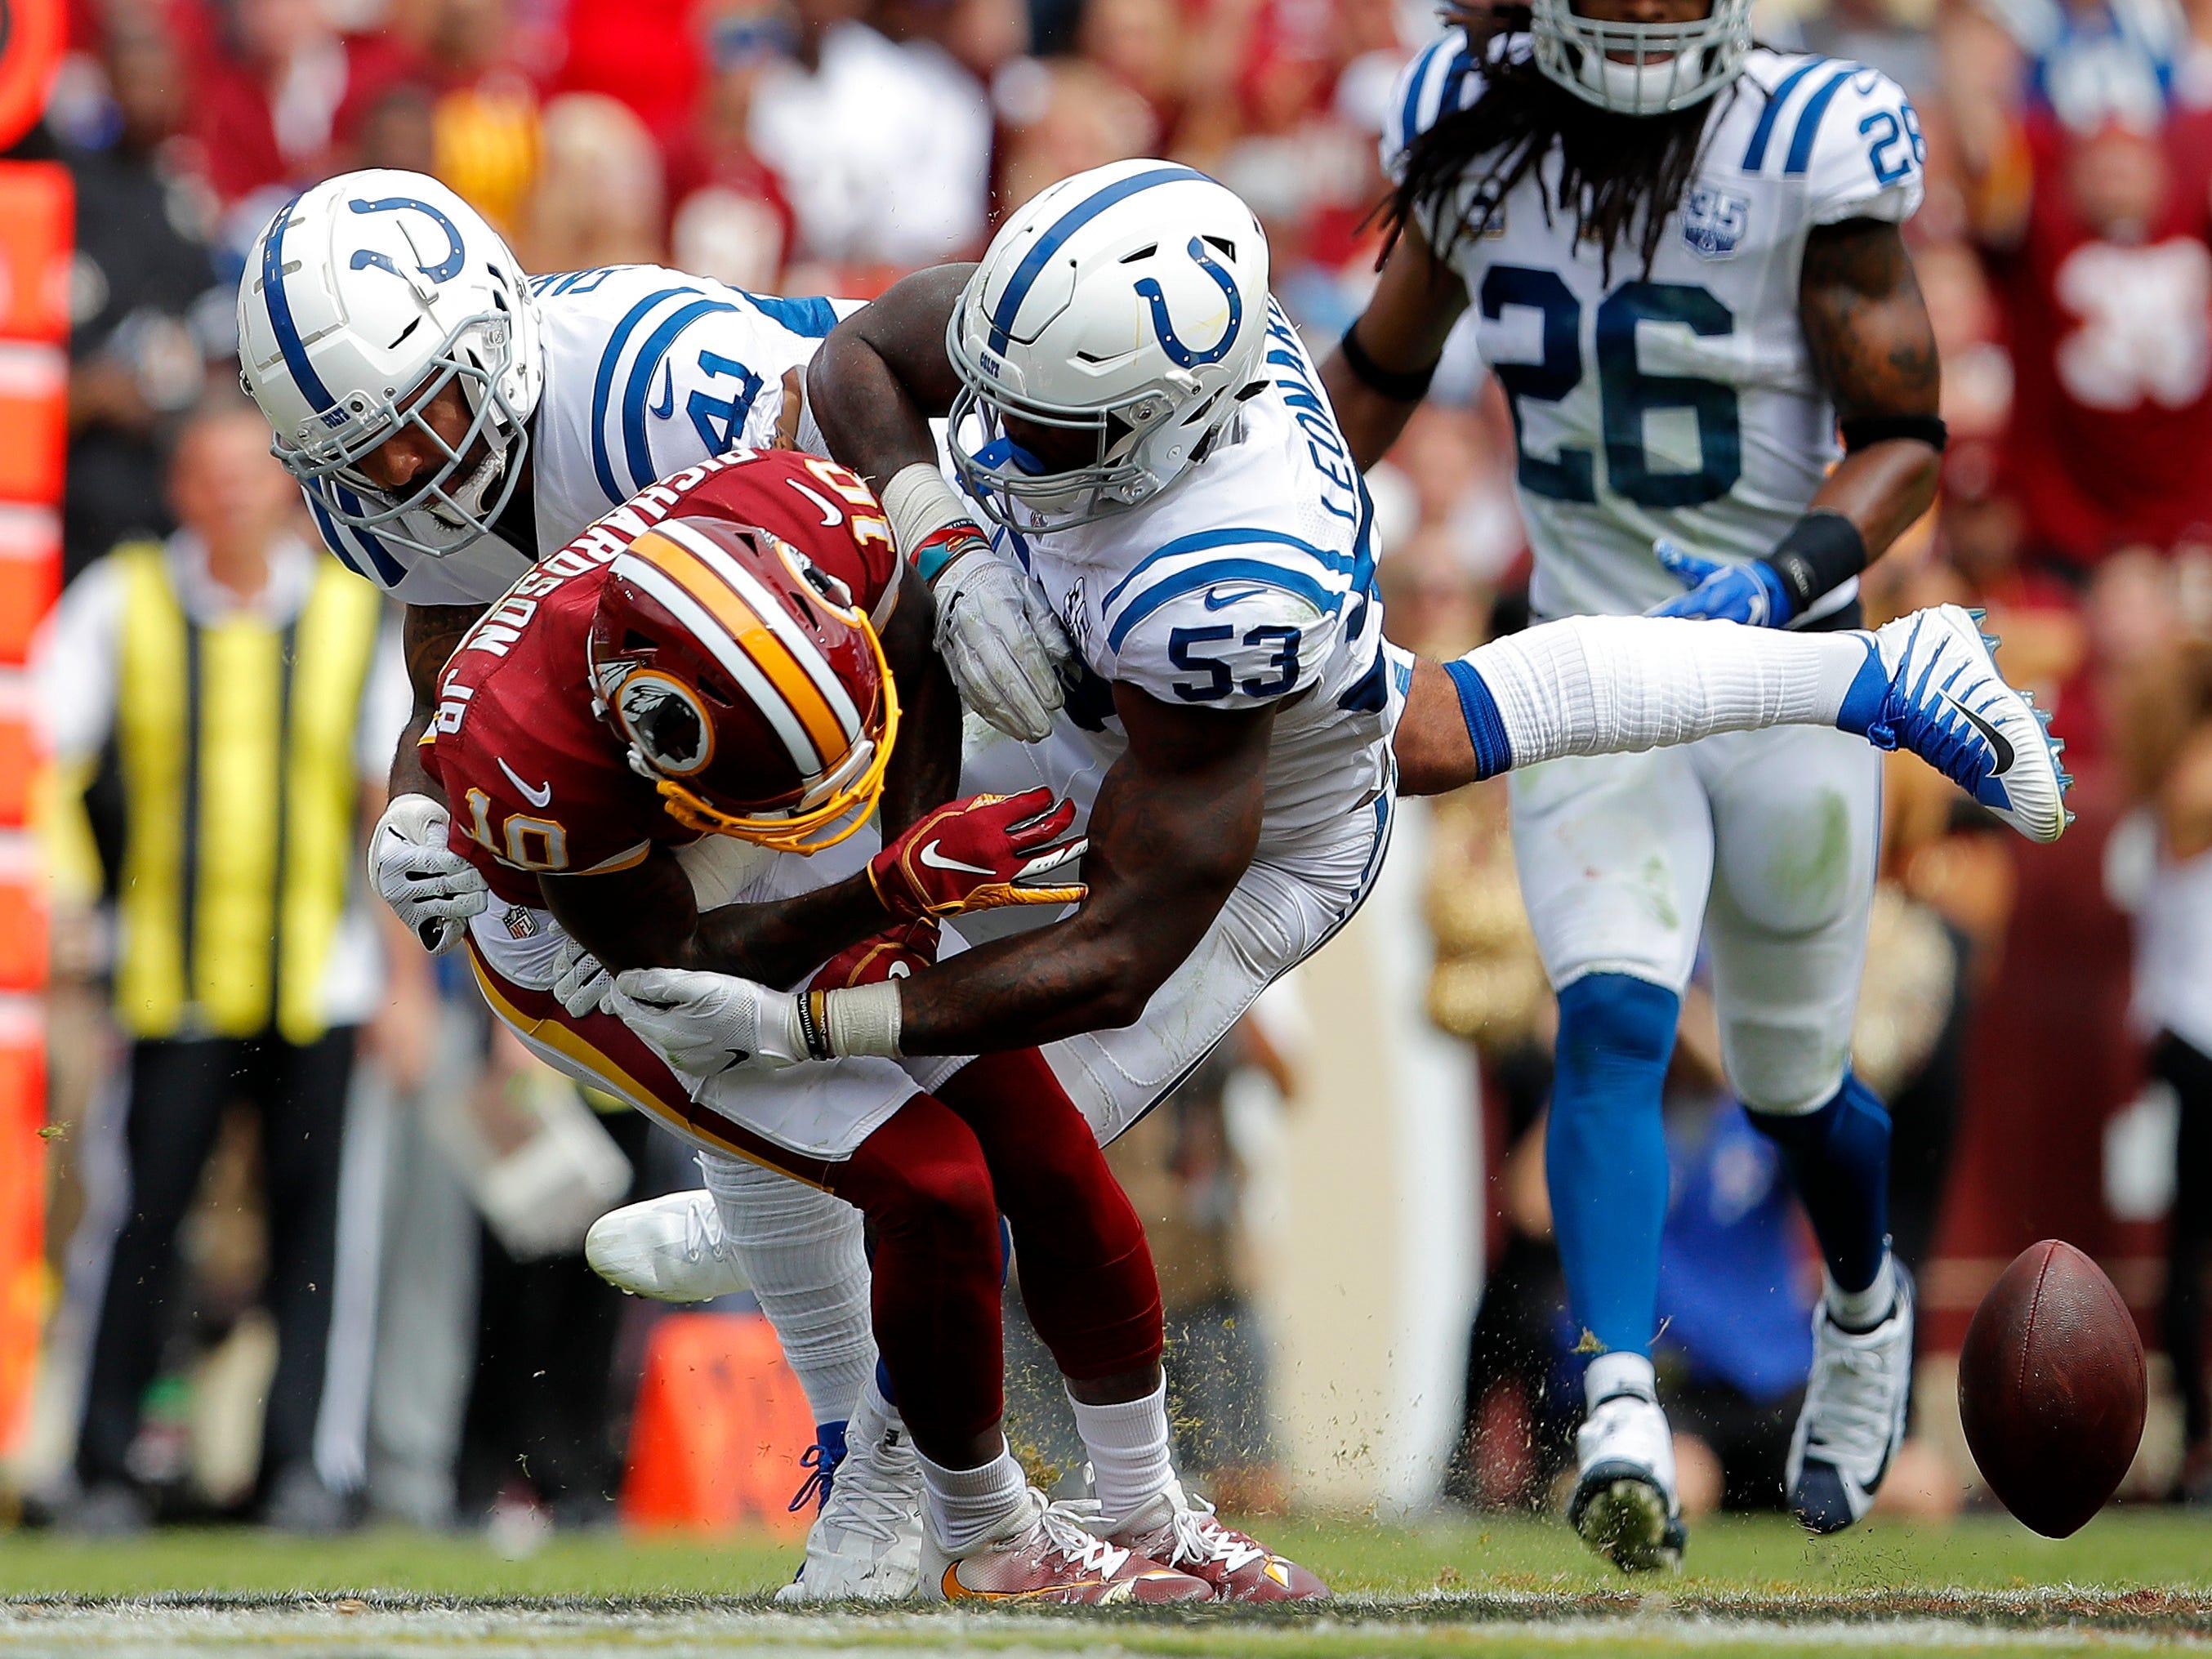 Indianapolis Colts defensive back Matthias Farley (41) joins Darius Leonard (53) in tackling Washington Redskins wide receiver Paul Richardson on Sept. 16, 2018.